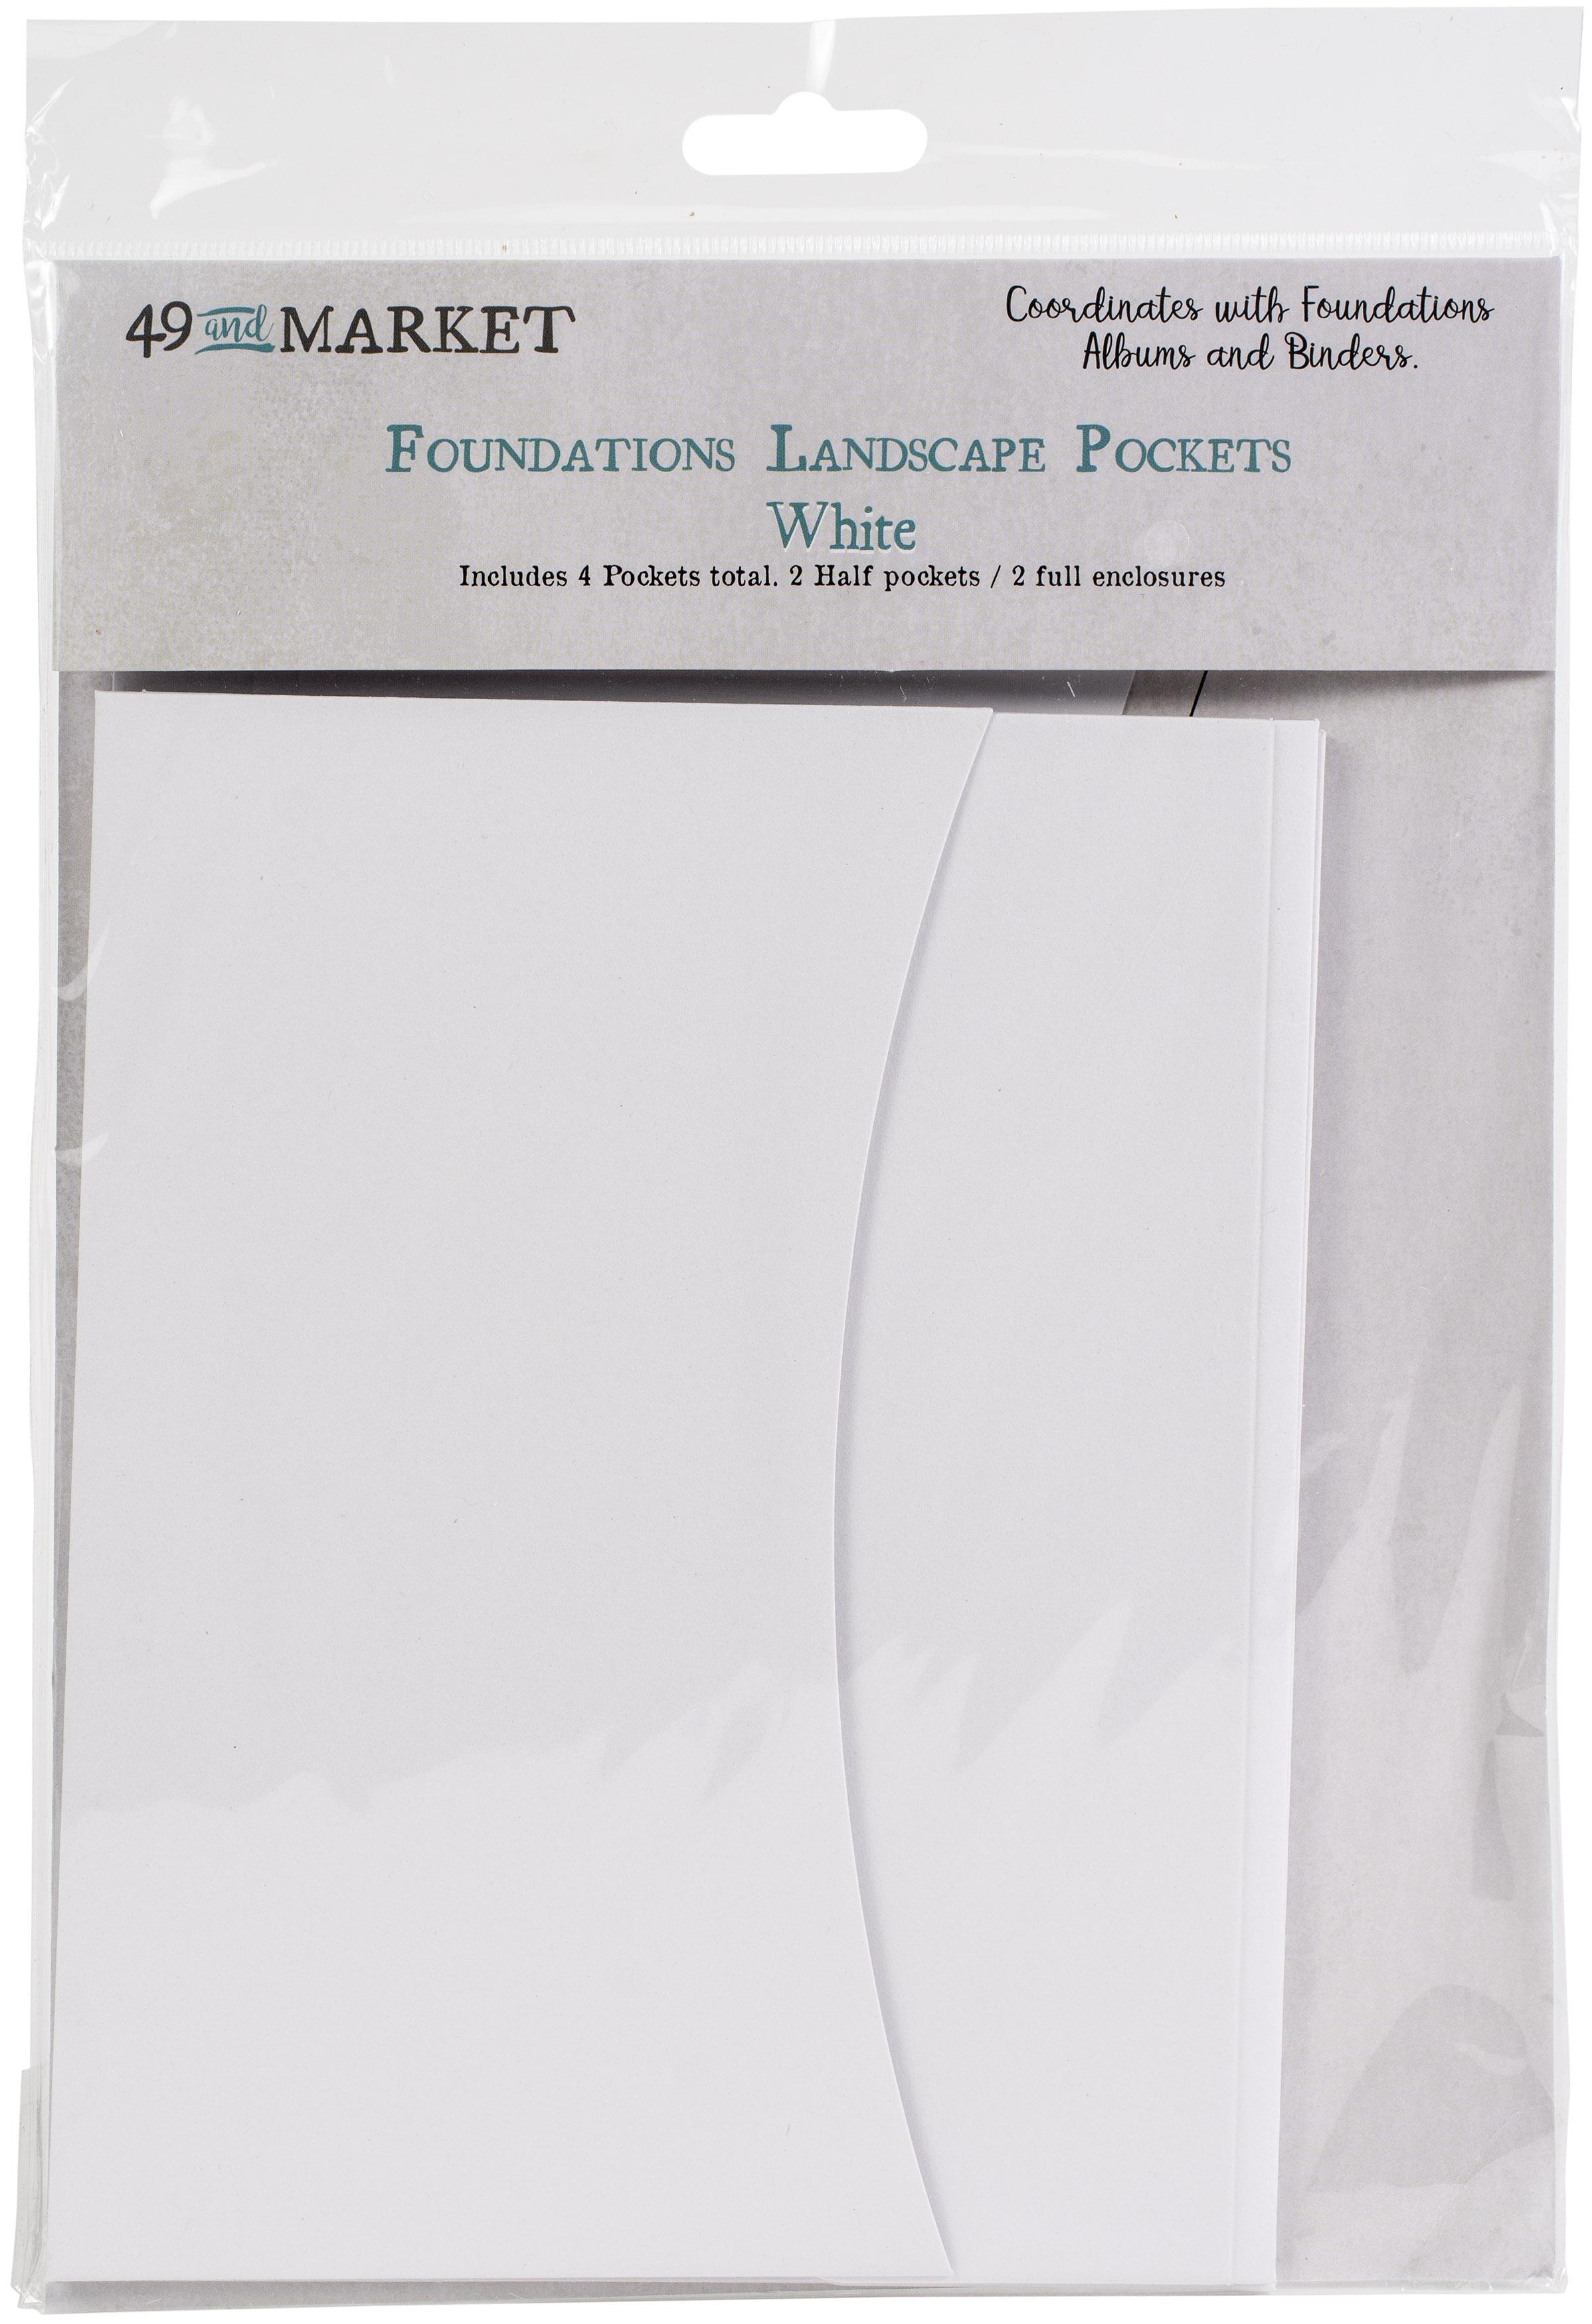 49 And Market Foundations Landscape Pockets-White